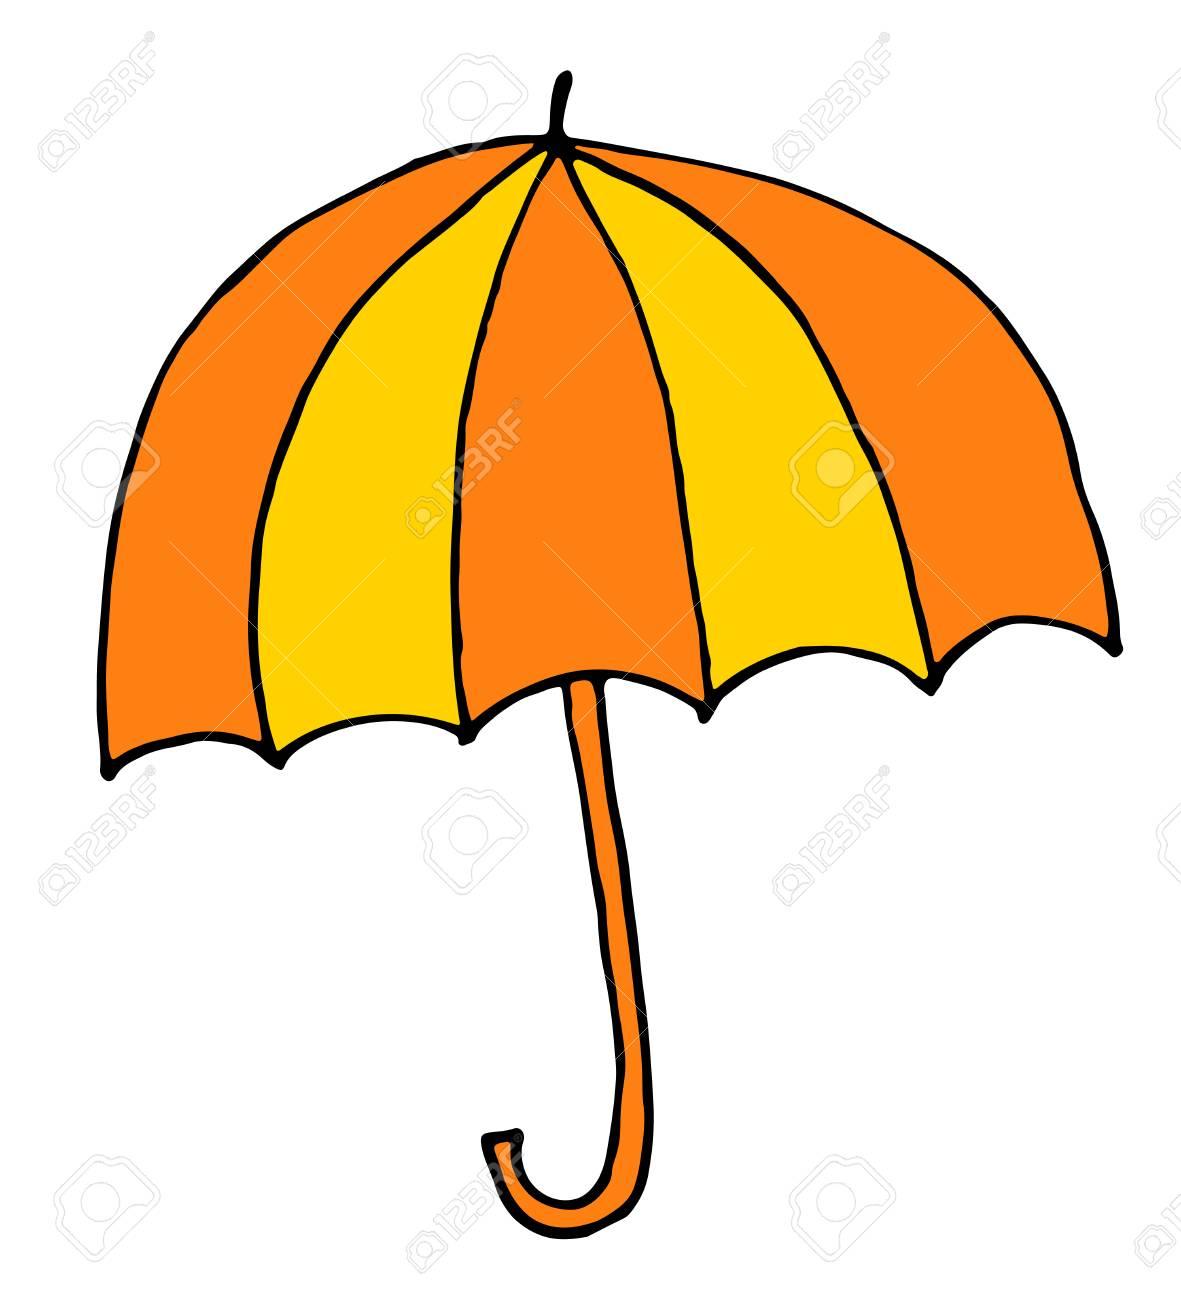 Umbrella hand drawing cartoon sketch vector illustration in doodle style stock vector 84890865